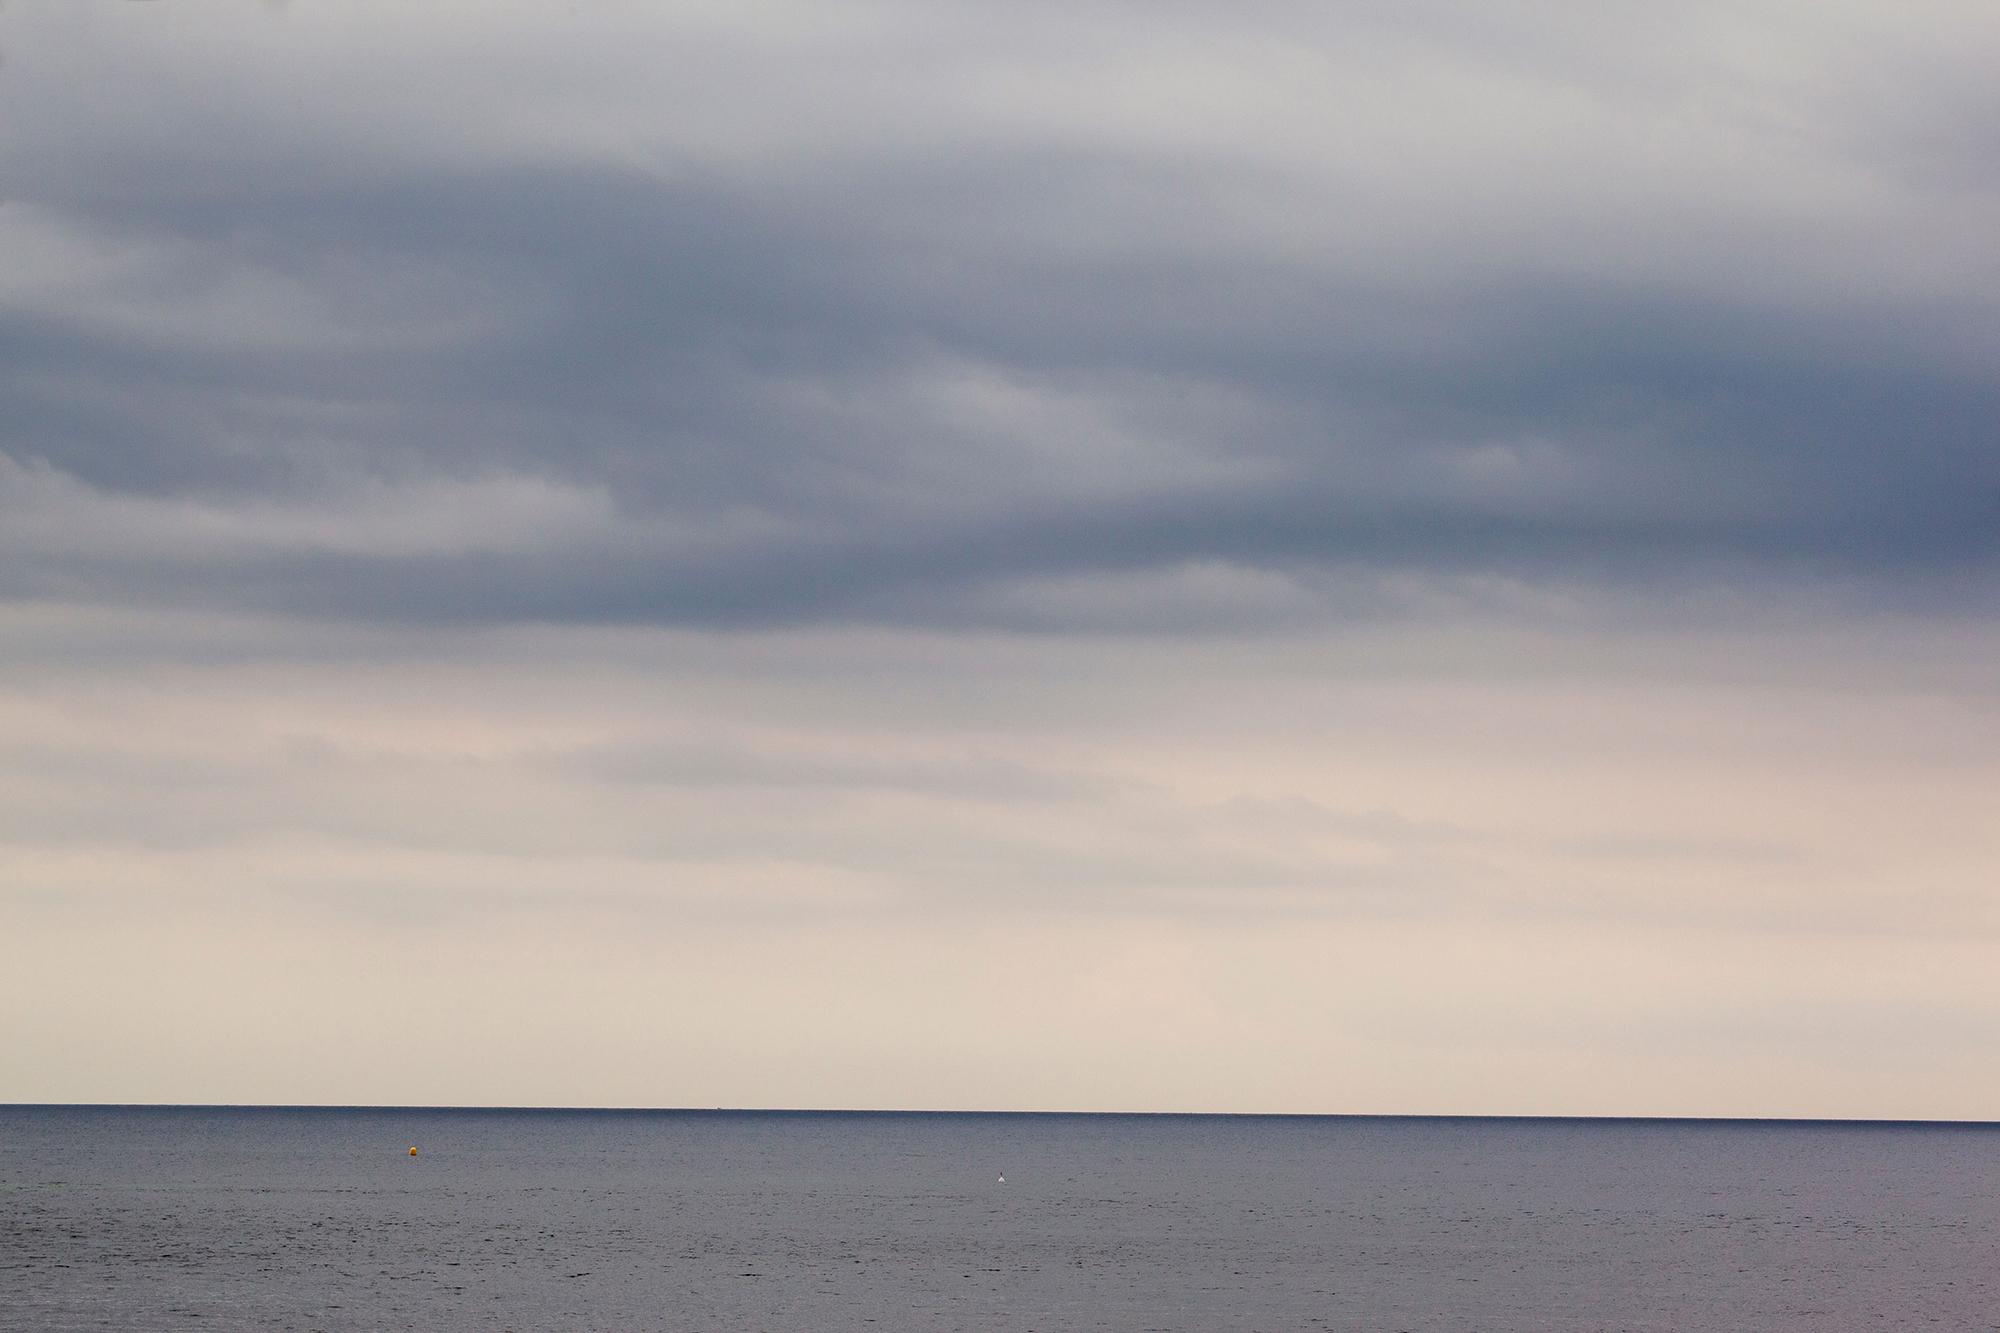 après la tempête horizon